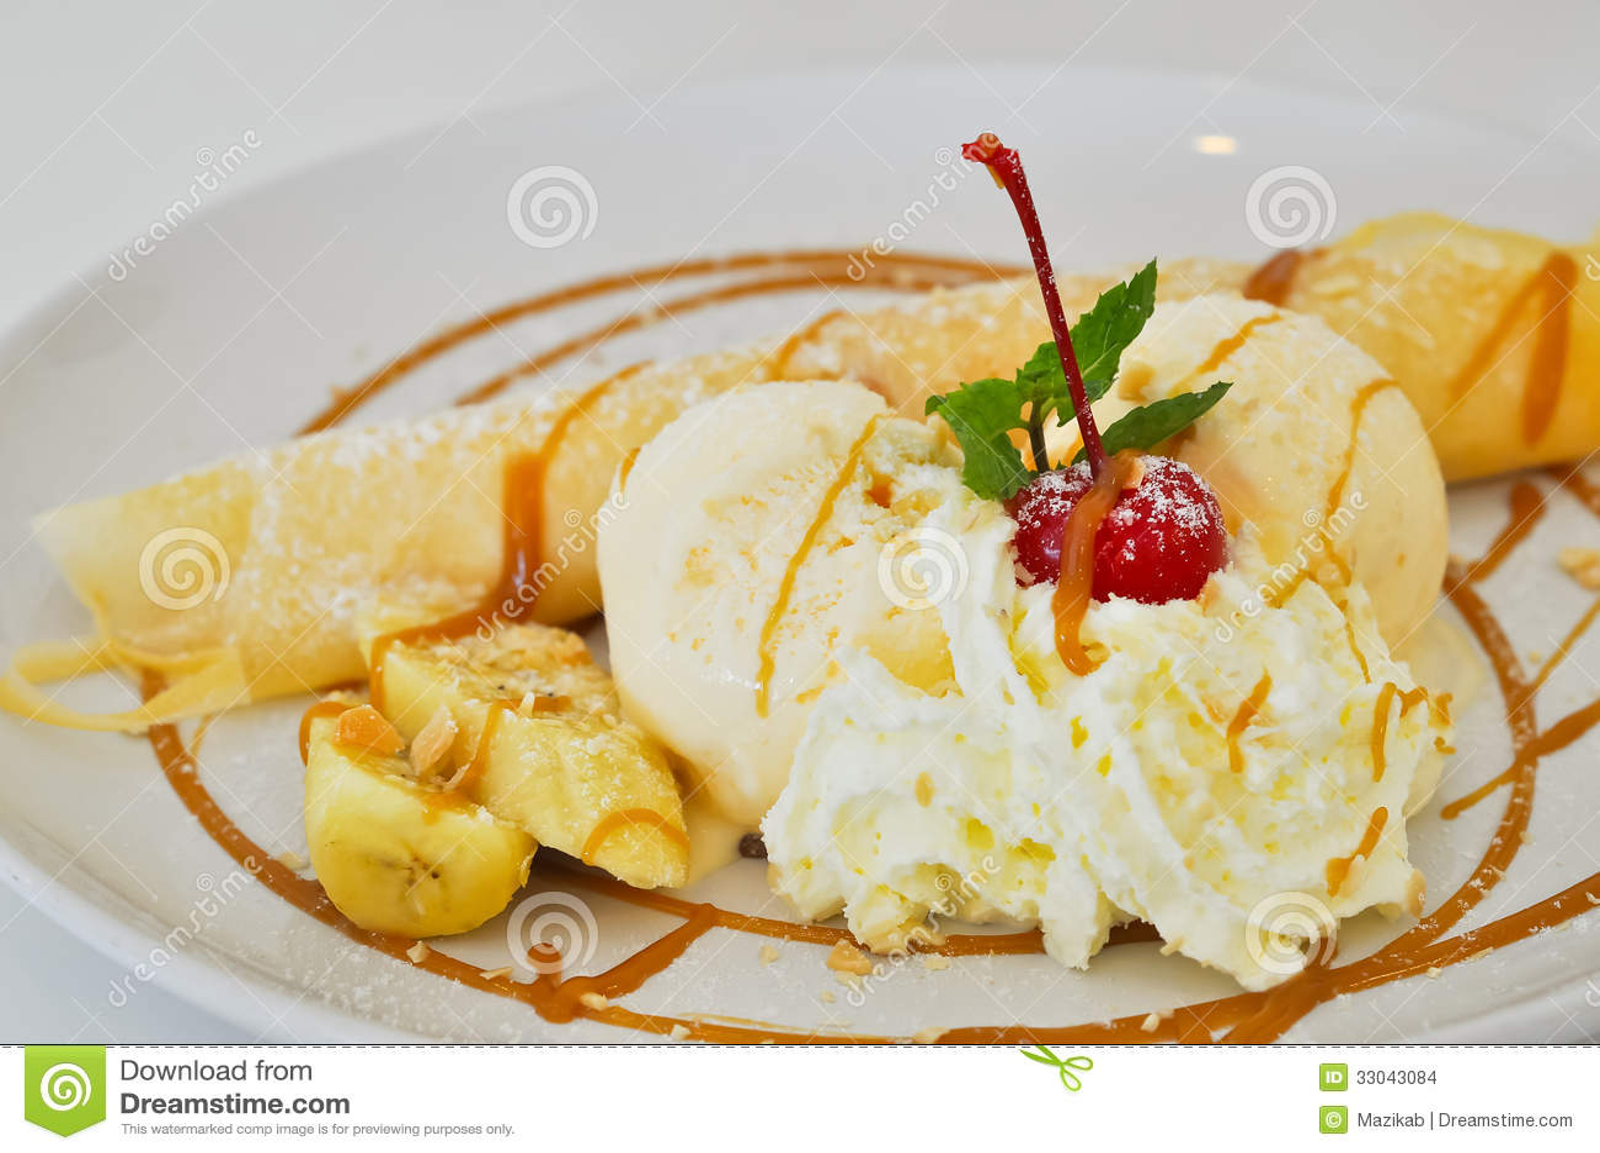 caramel-banana-crepe-ice-cream-vanilla-crepes-stuffed-bananas-topped ...